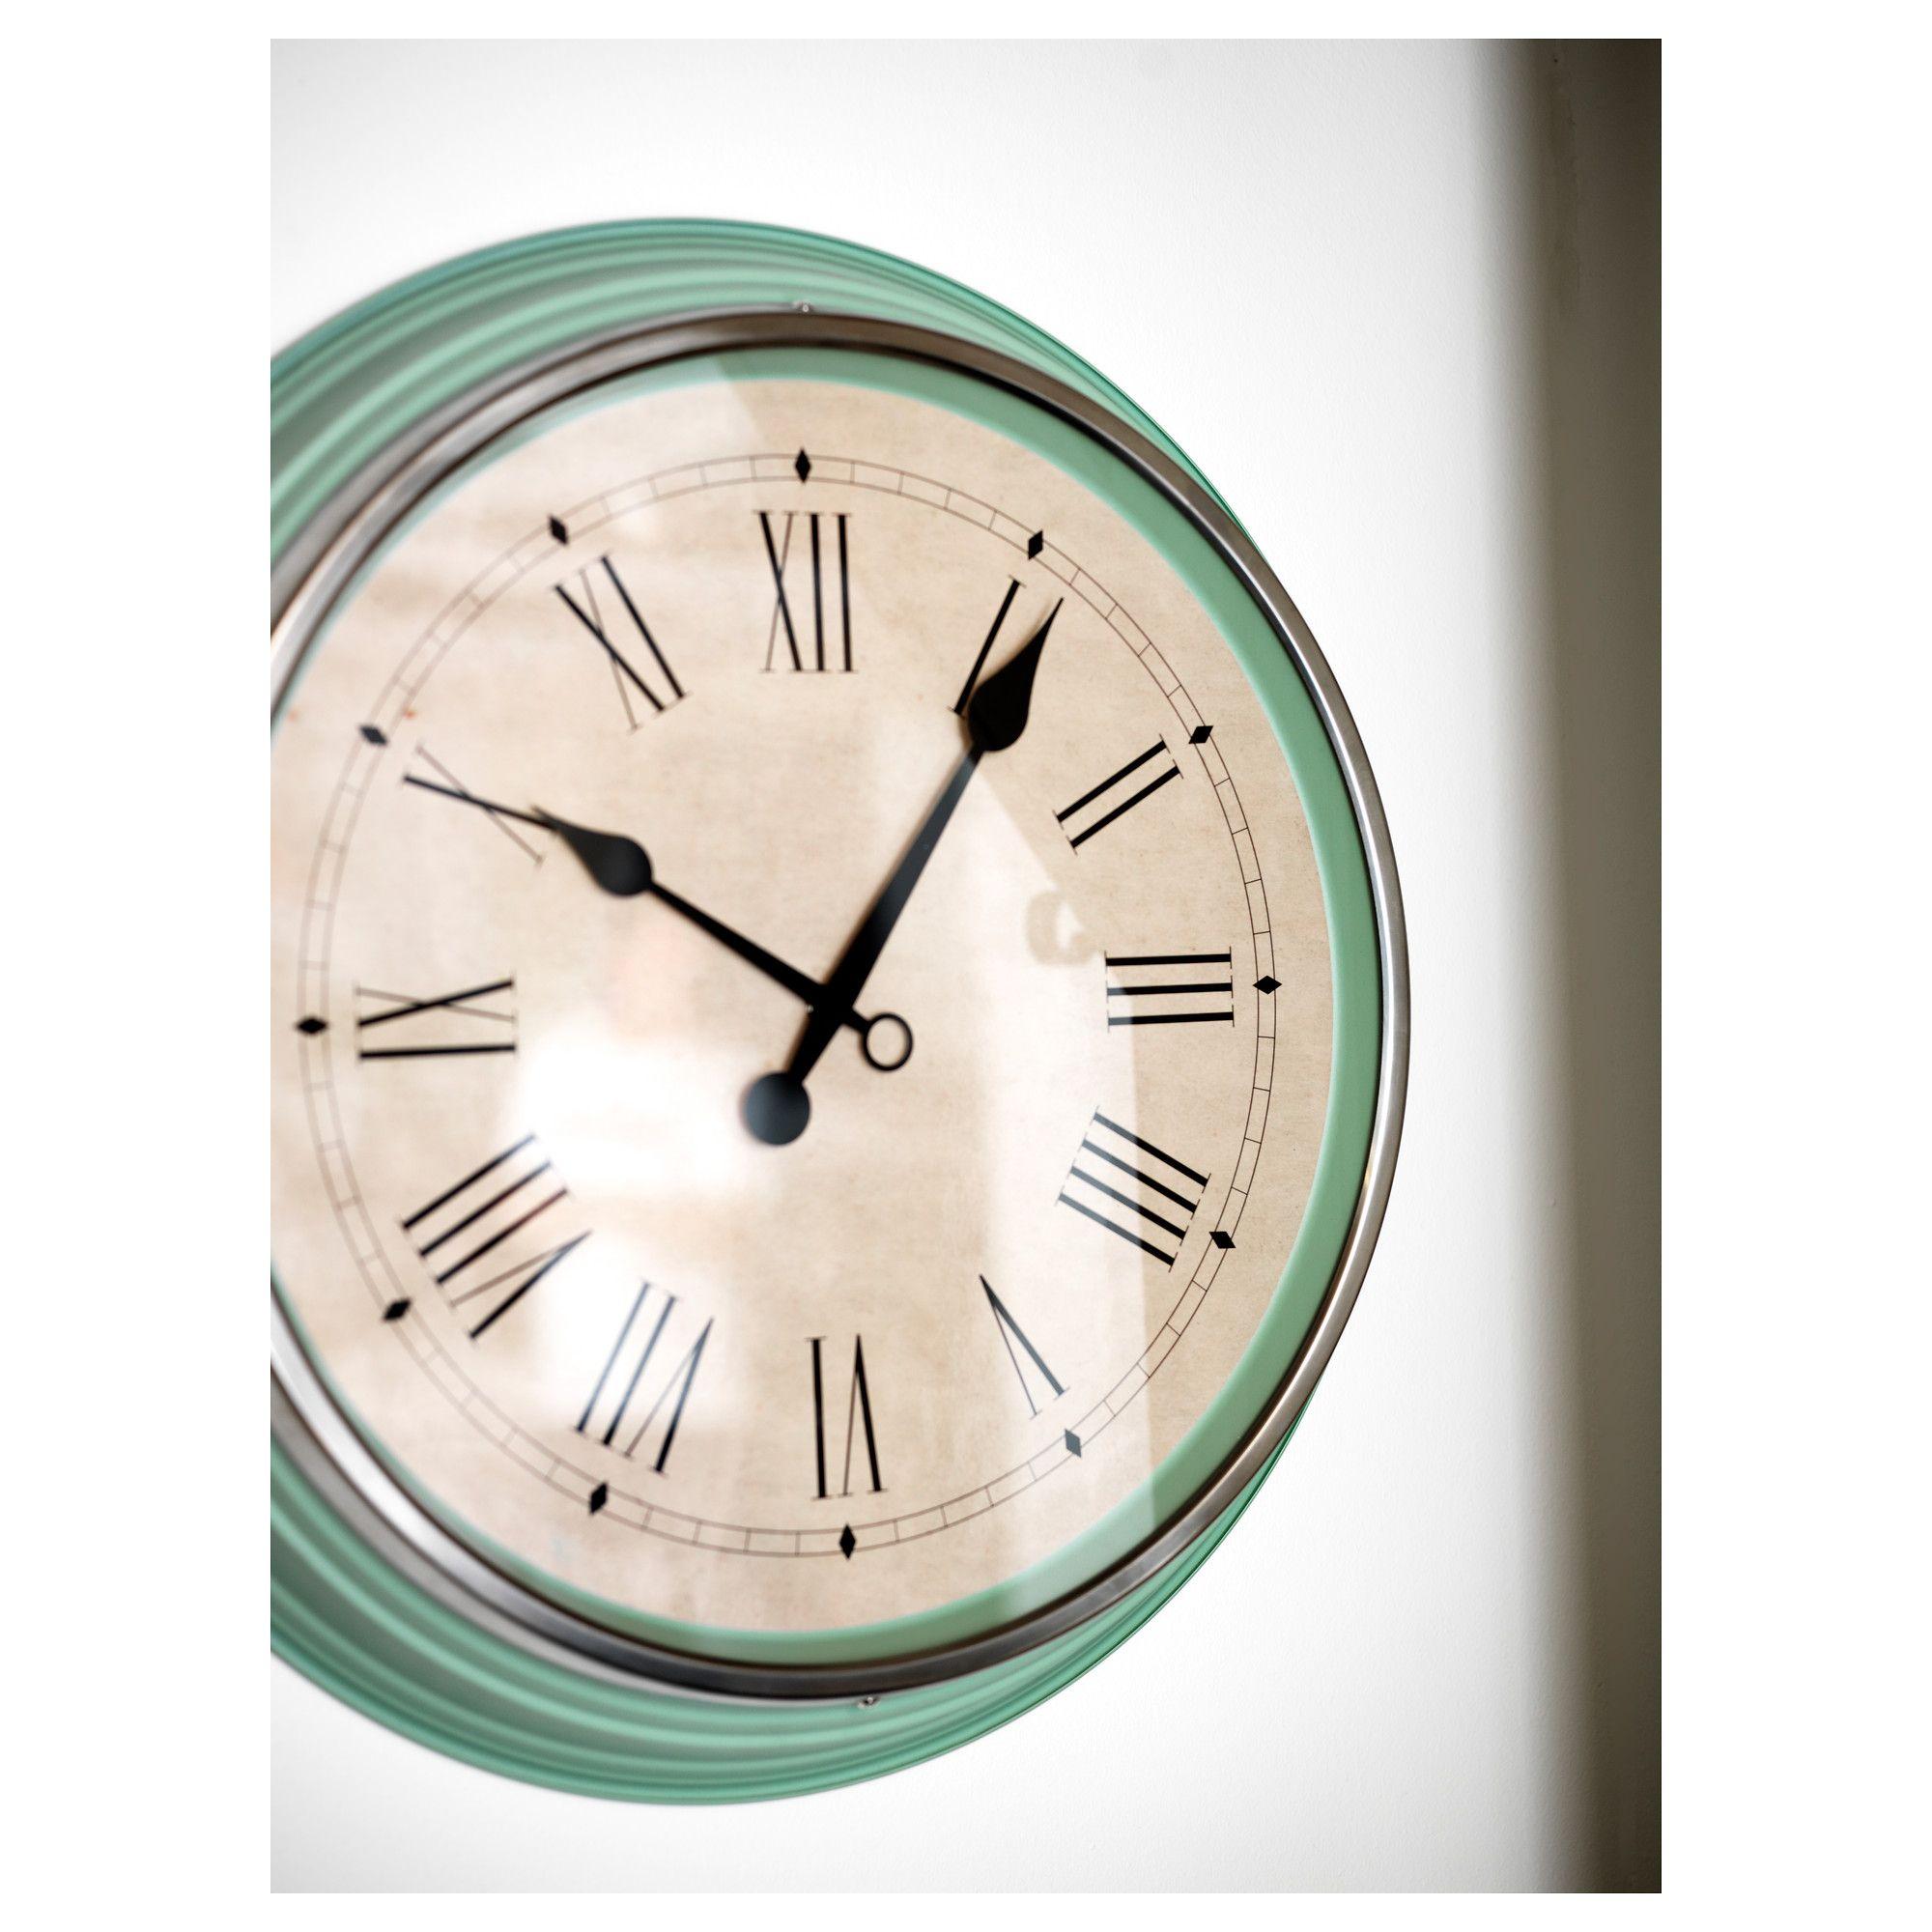 Ikea Skovel Wall Clock Green Products Pinterest Wall Clocks